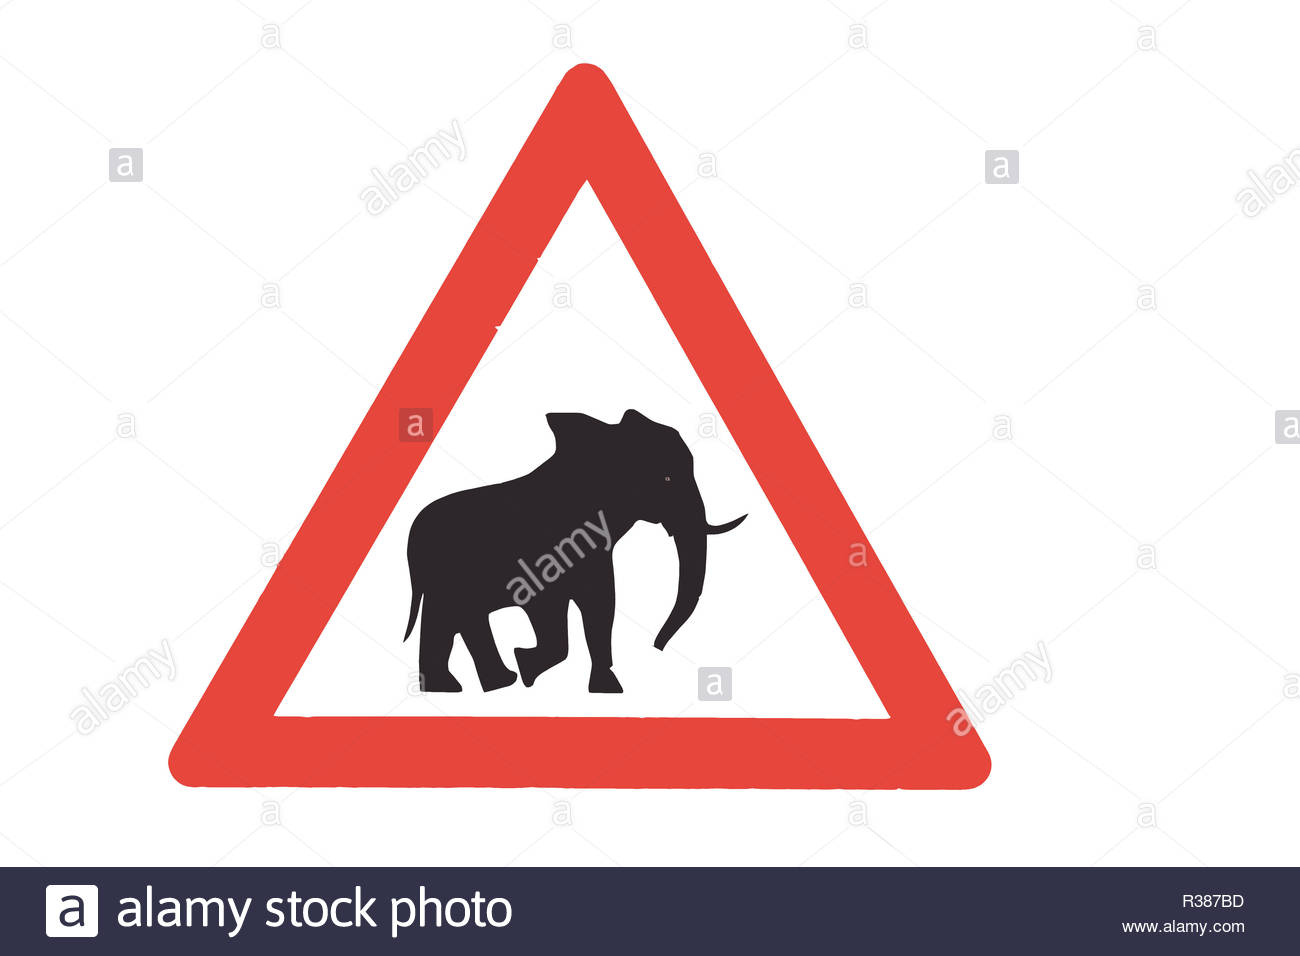 elephant crossing sign - Stock Image